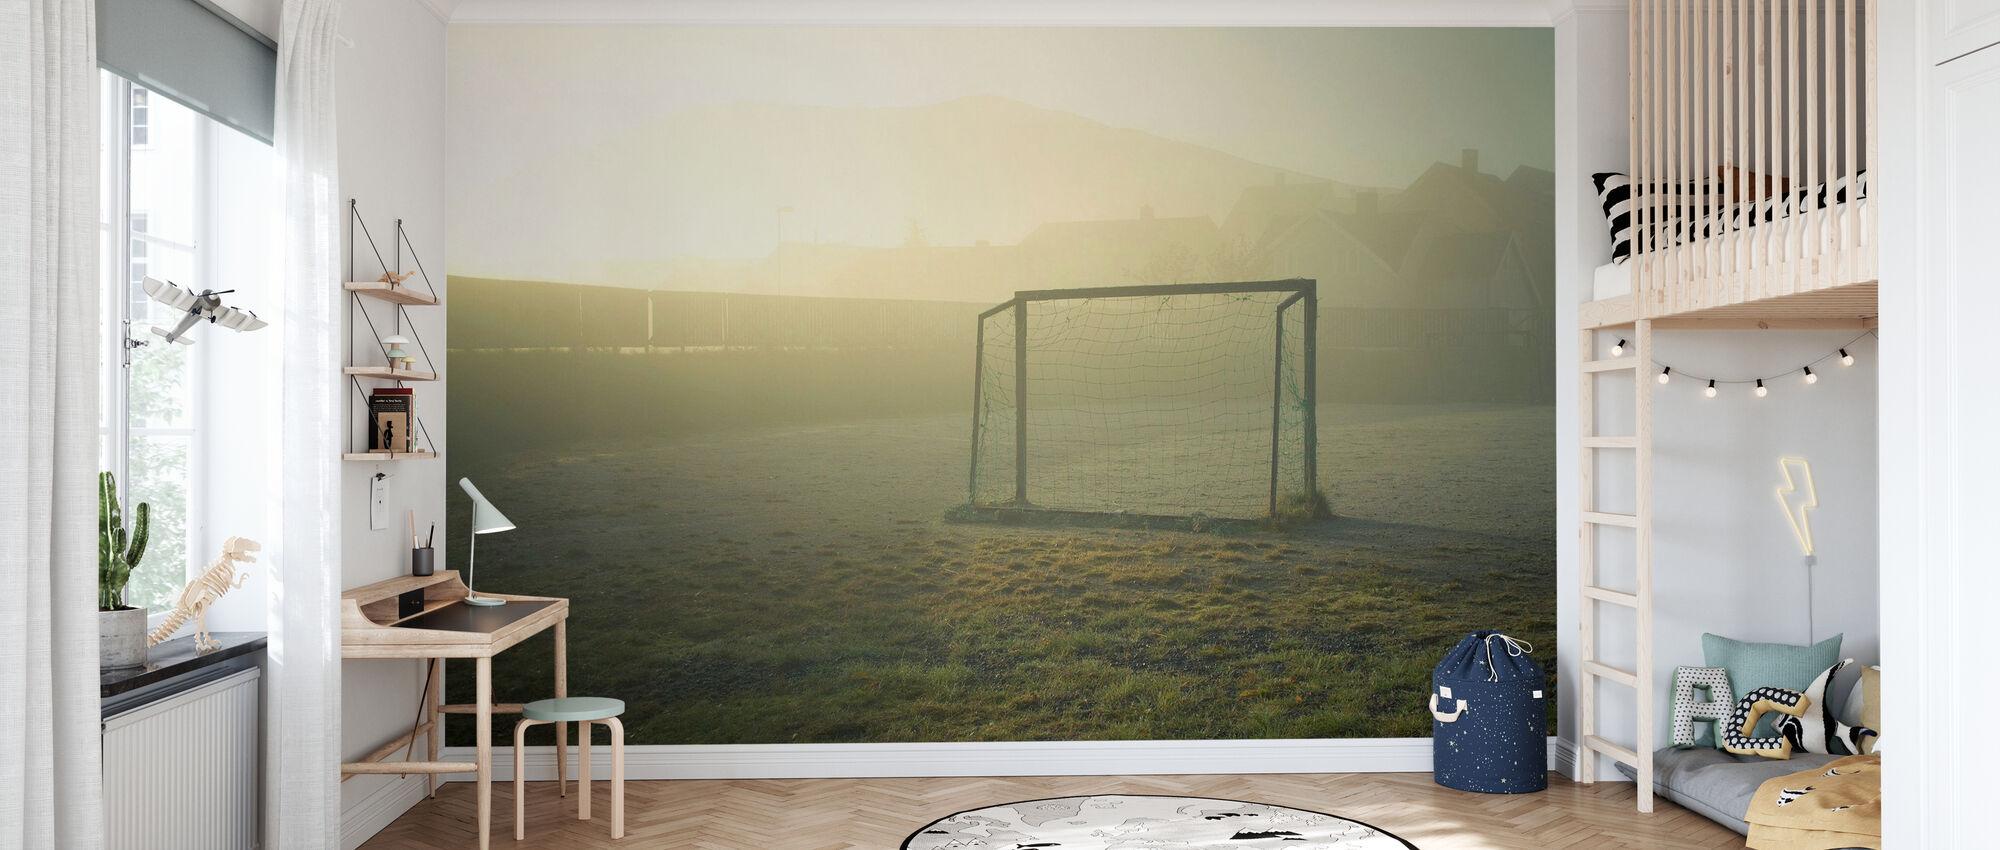 Soccer Field in Sunlight - Wallpaper - Kids Room